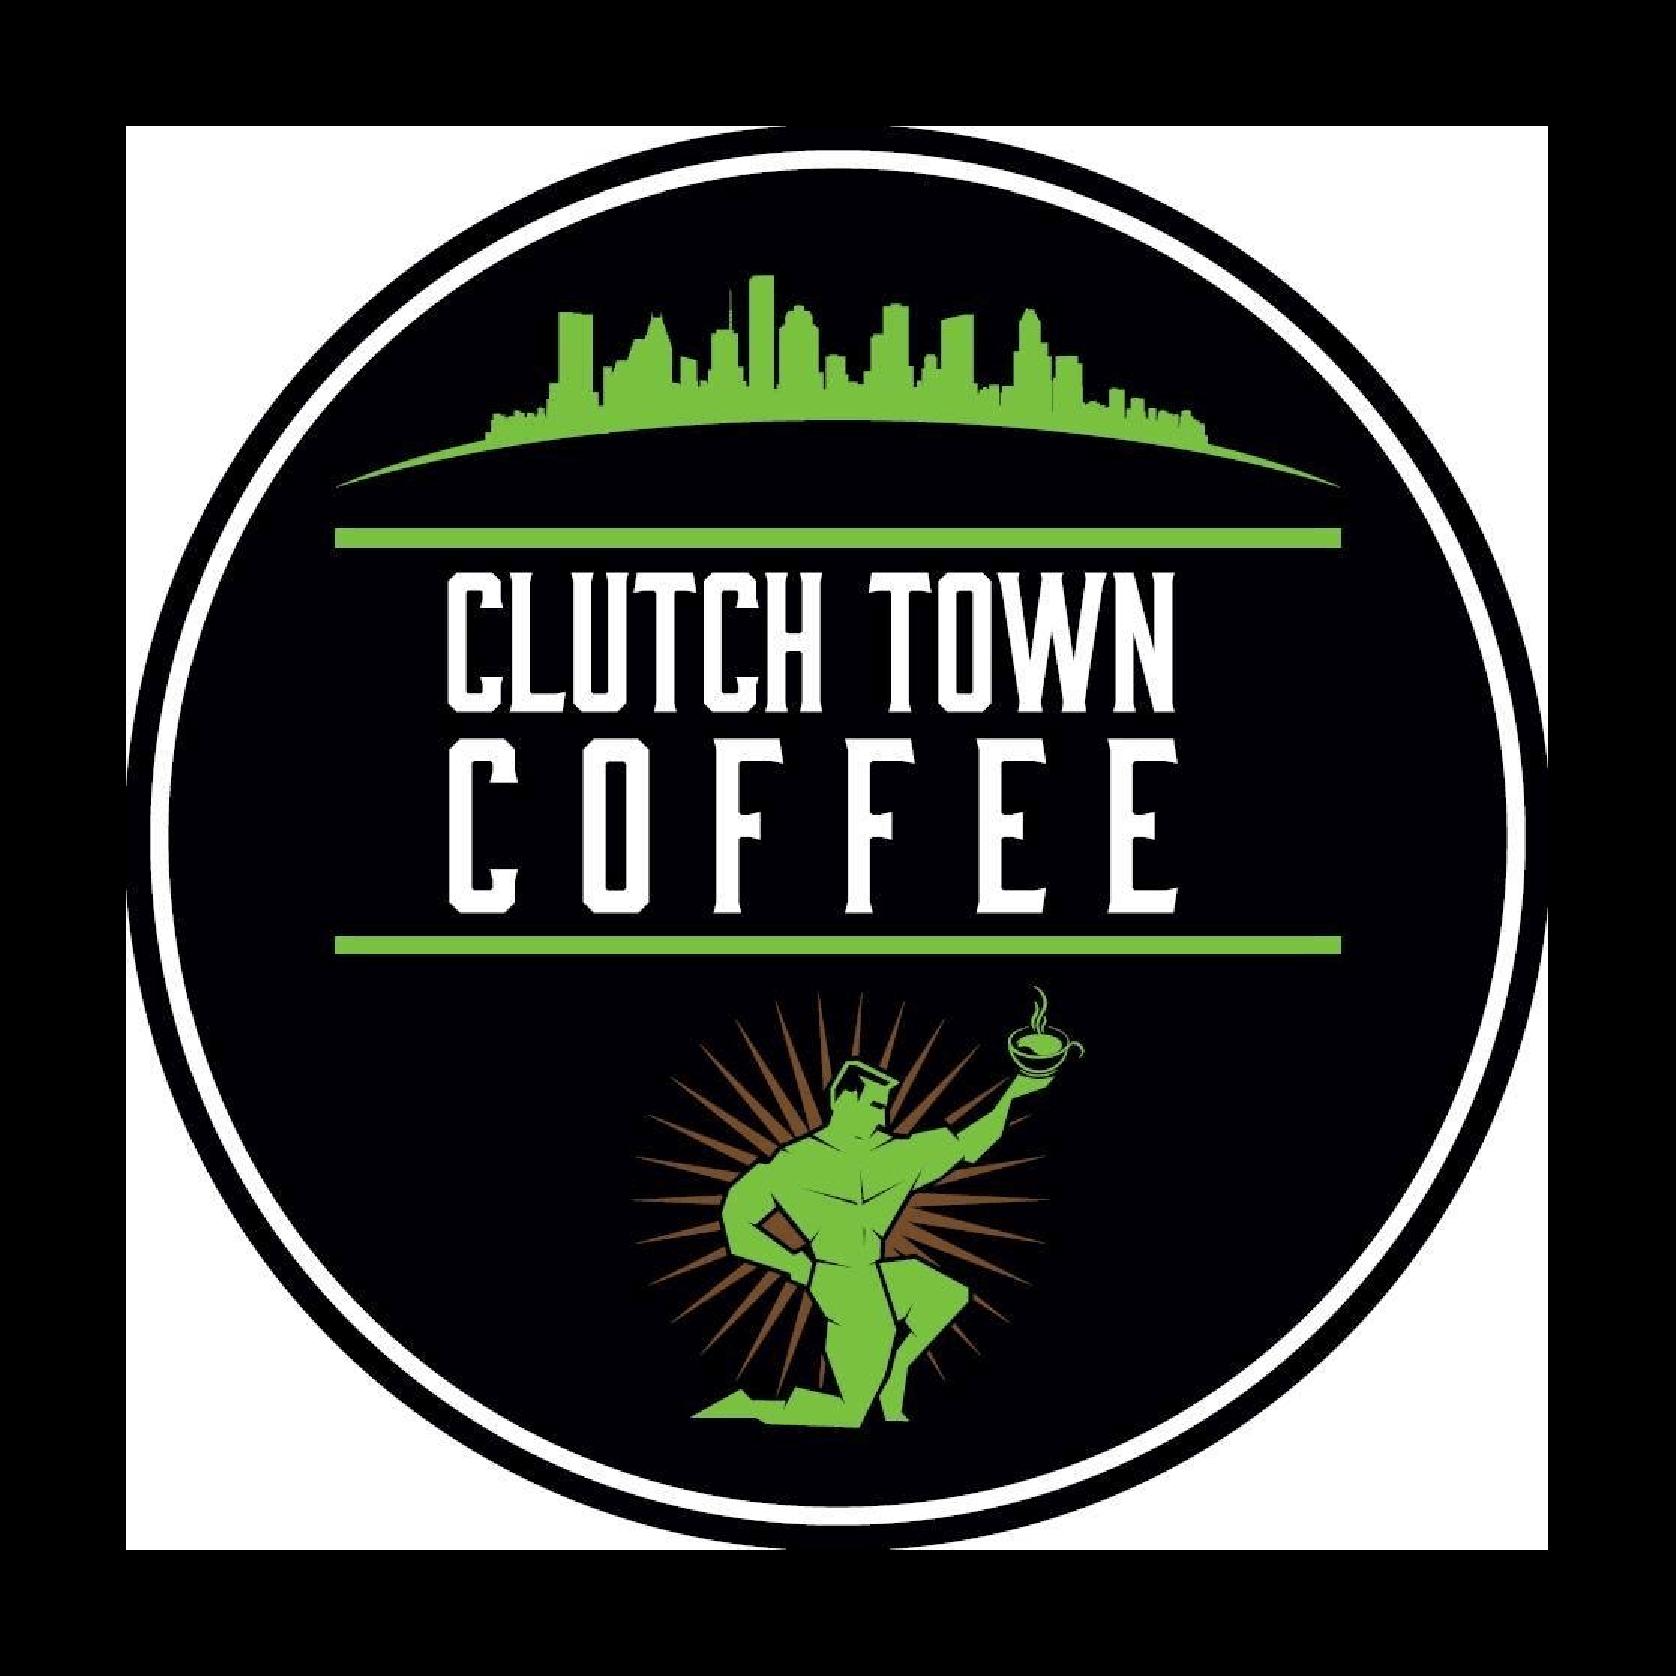 Clutch Town Coffee